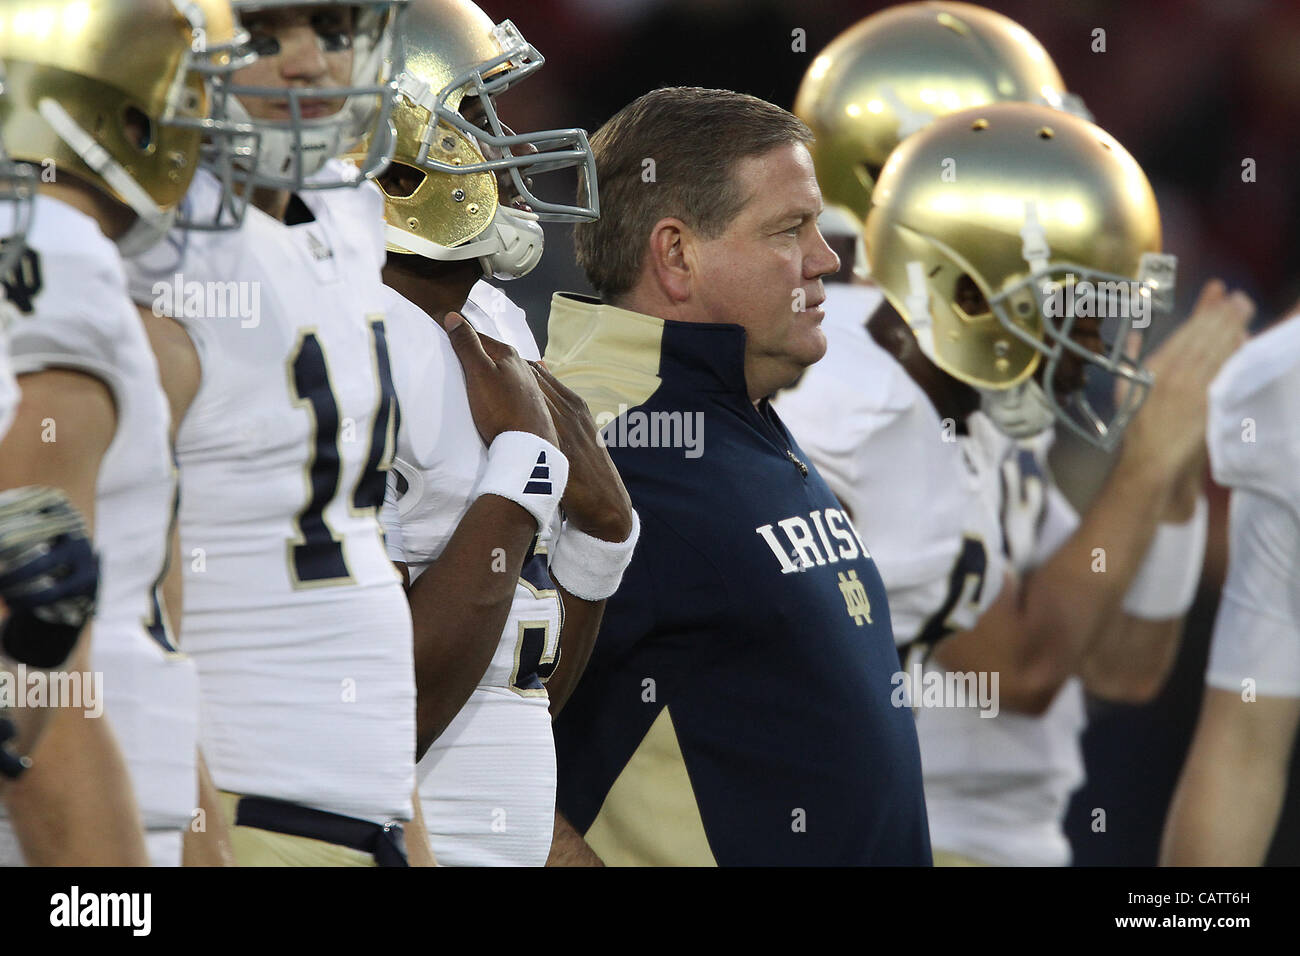 Nov. 26, 2011 - Palo Alto, California, USA - Notre Dame's Head Coach Brian Kelly. The Notre Dame Fighting Irish Stock Photo